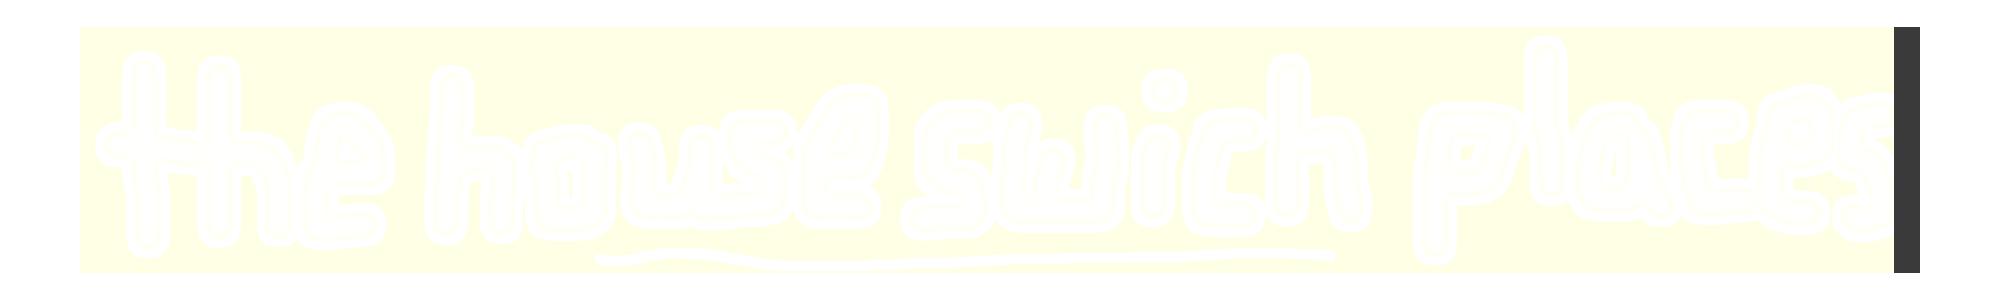 houswich [oneline edition )